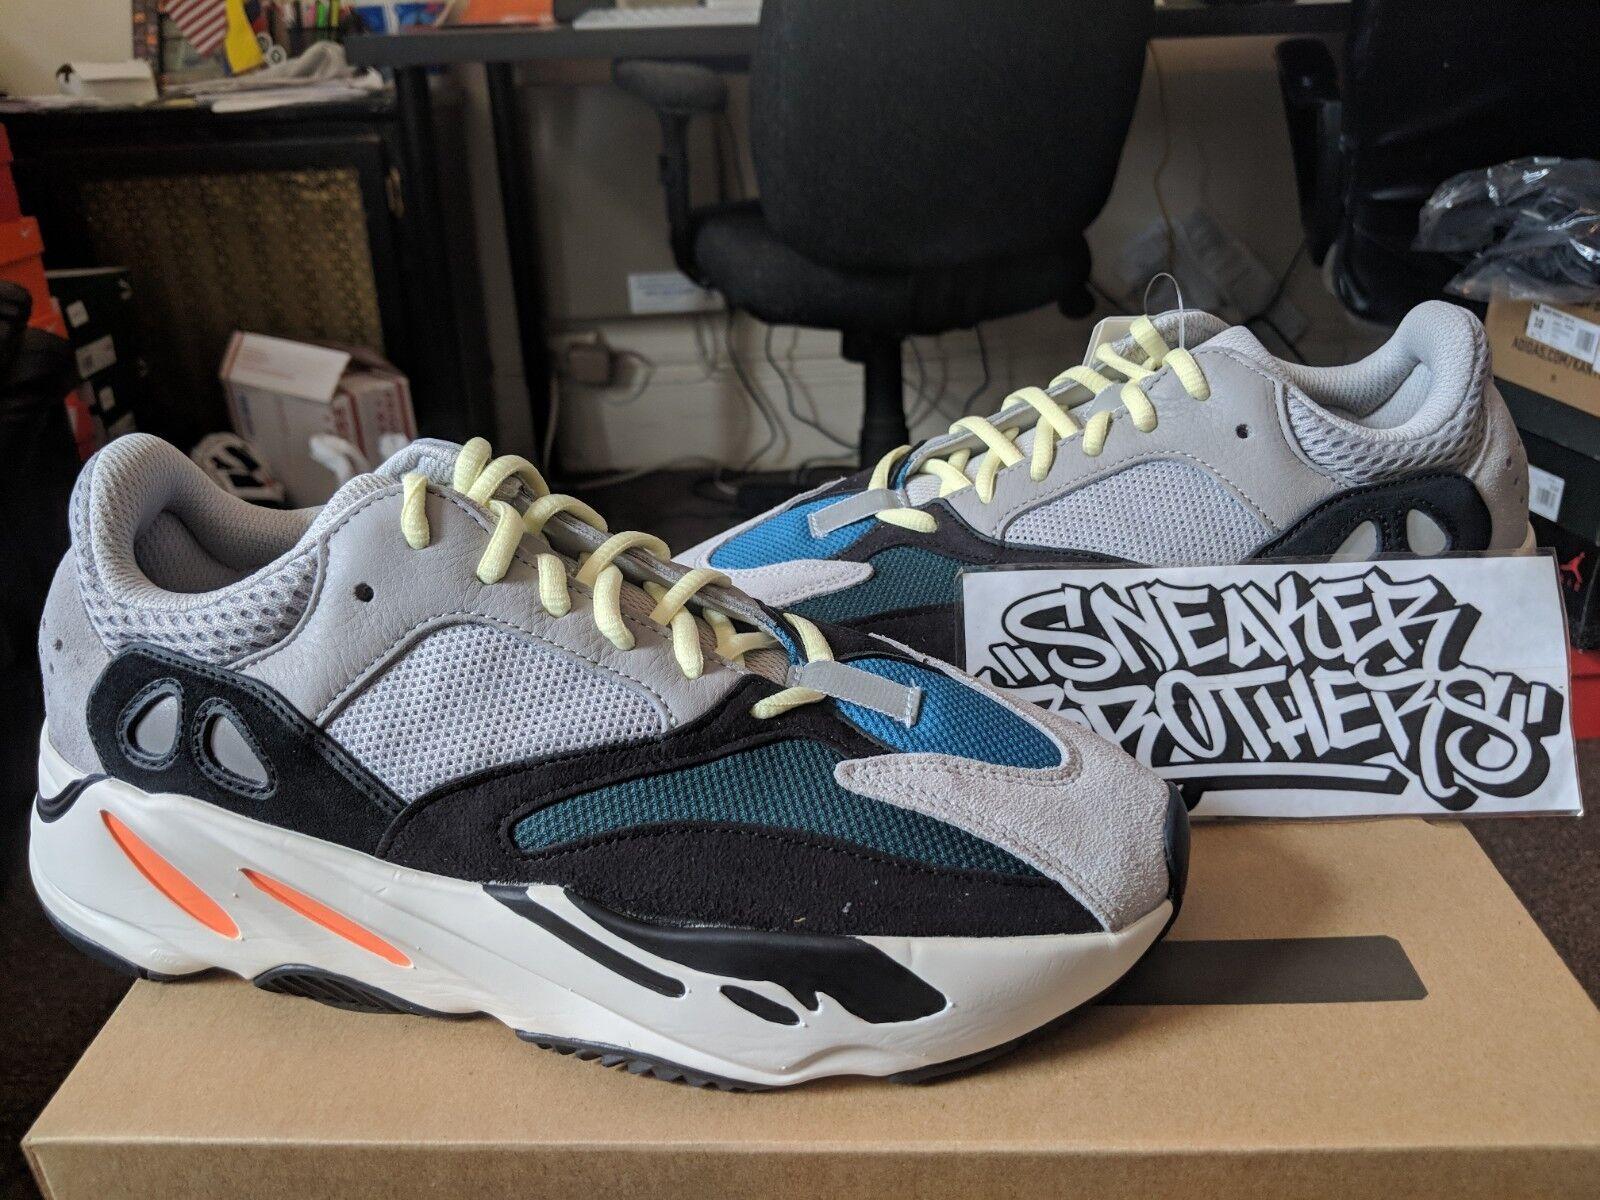 Adidas Yeezy Boost 700 Wave Runner OG Grey Core White Black Kanye West B75571